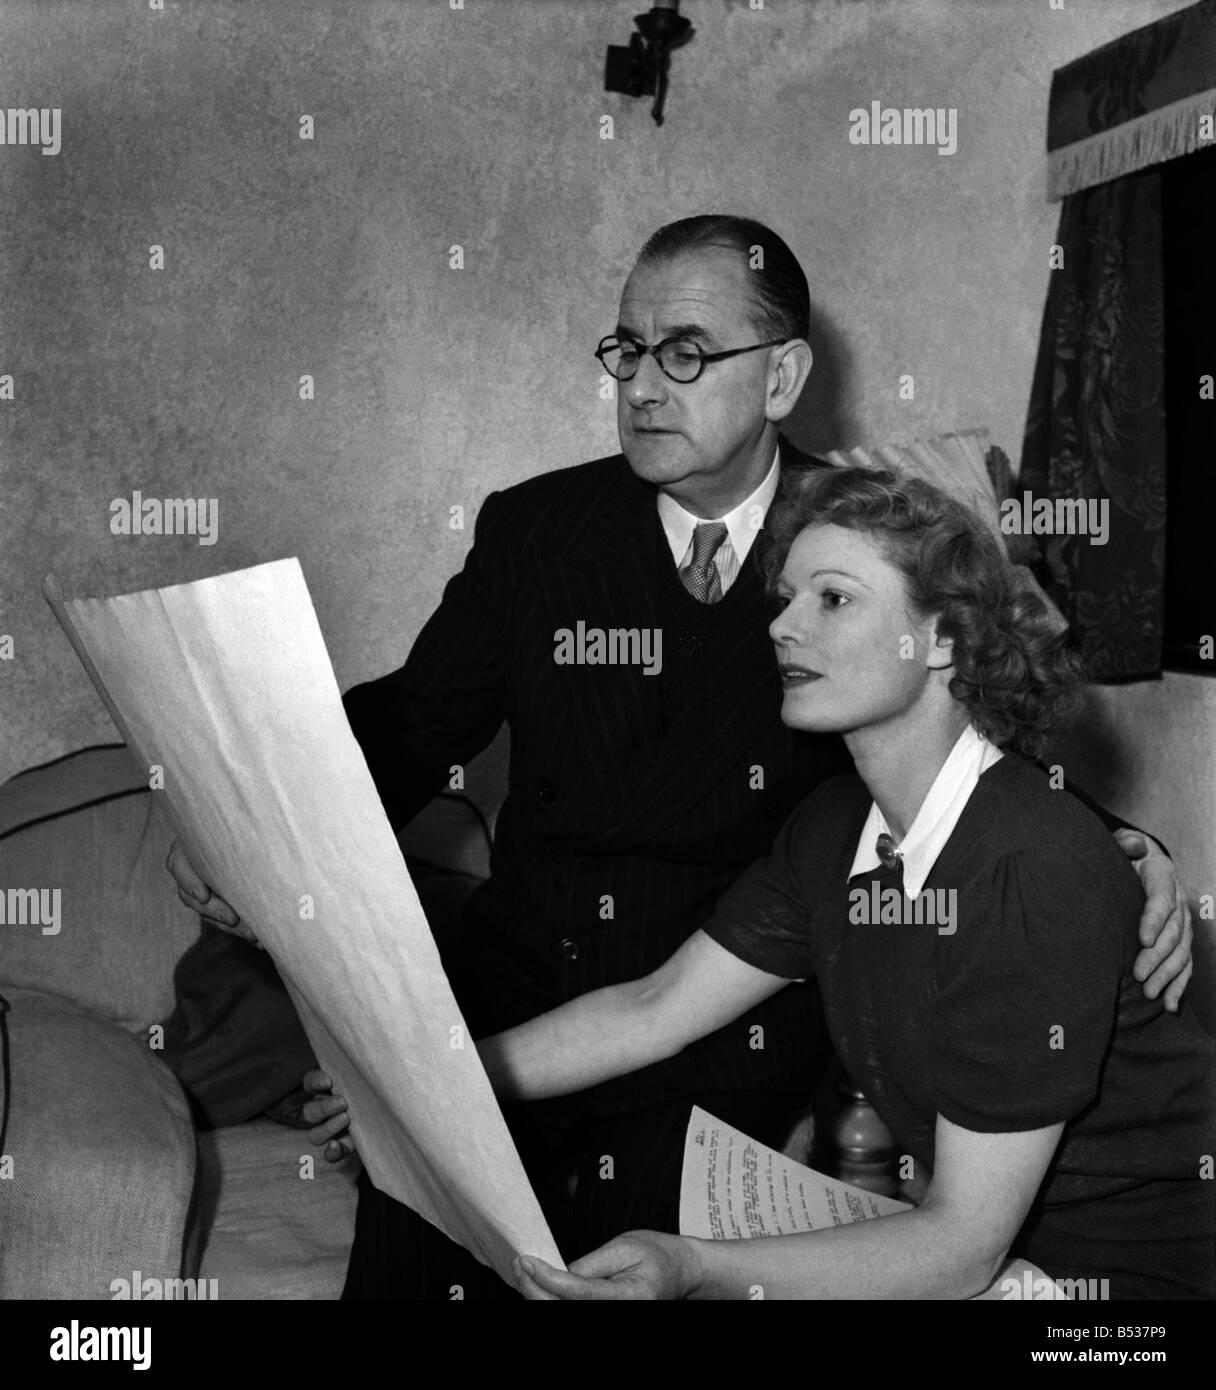 Anna Neagle and husband Herbert Wilcox. January 1948 O11114-003 - Stock Image